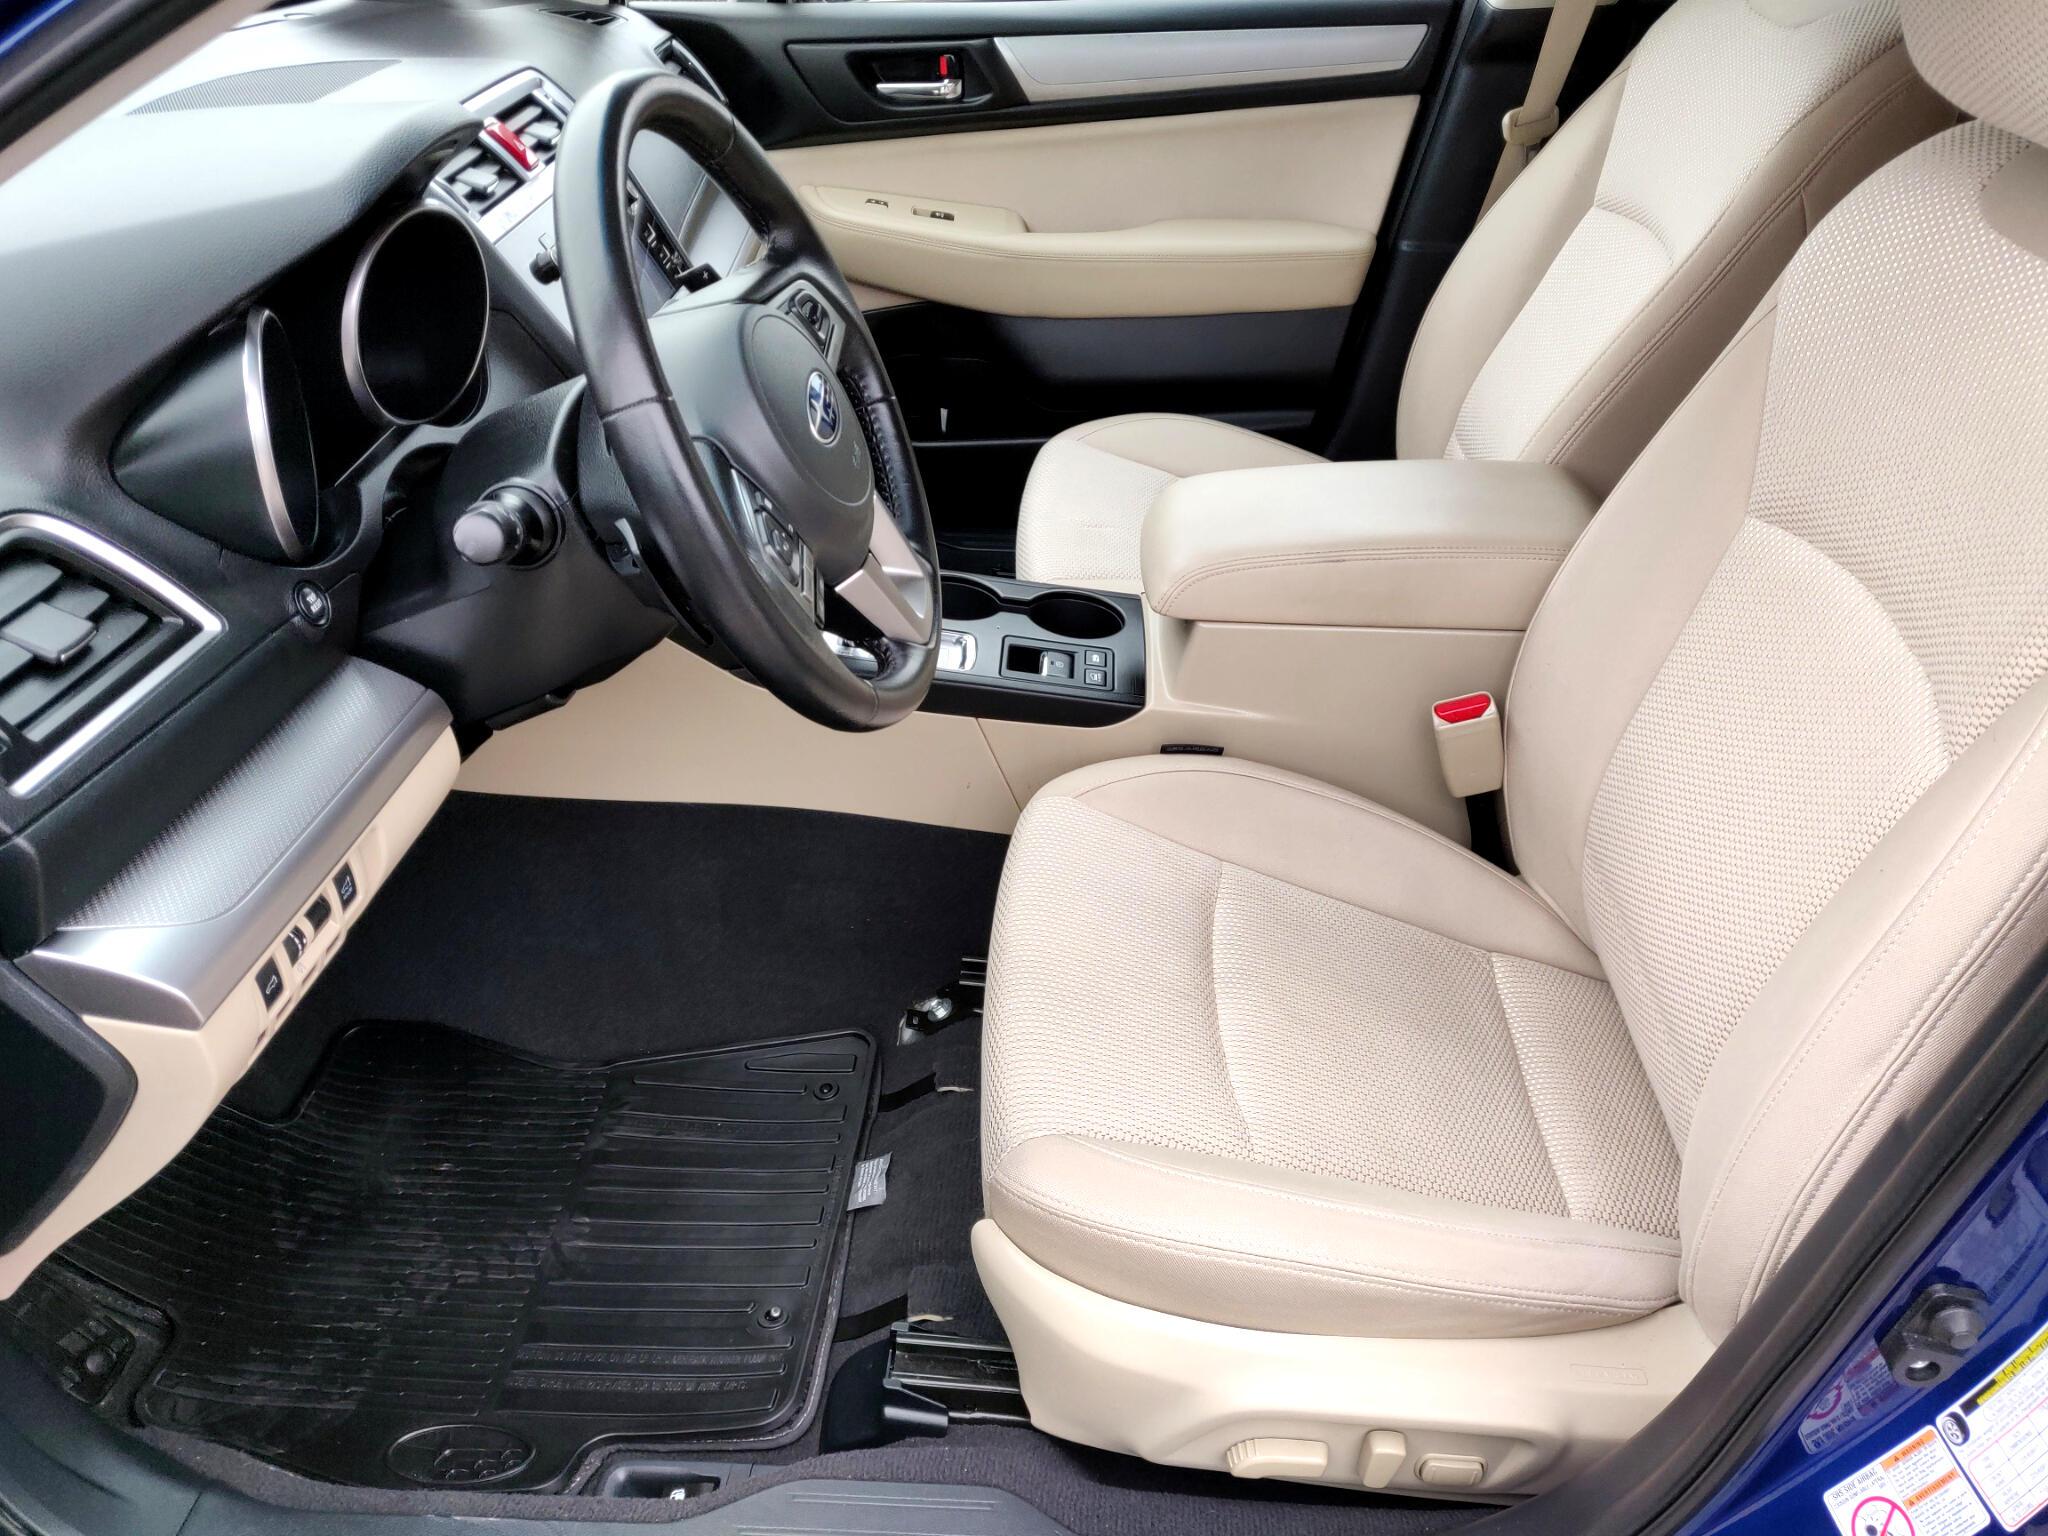 2016 Subaru Outback 4dr Wgn 2.5i Premium PZEV